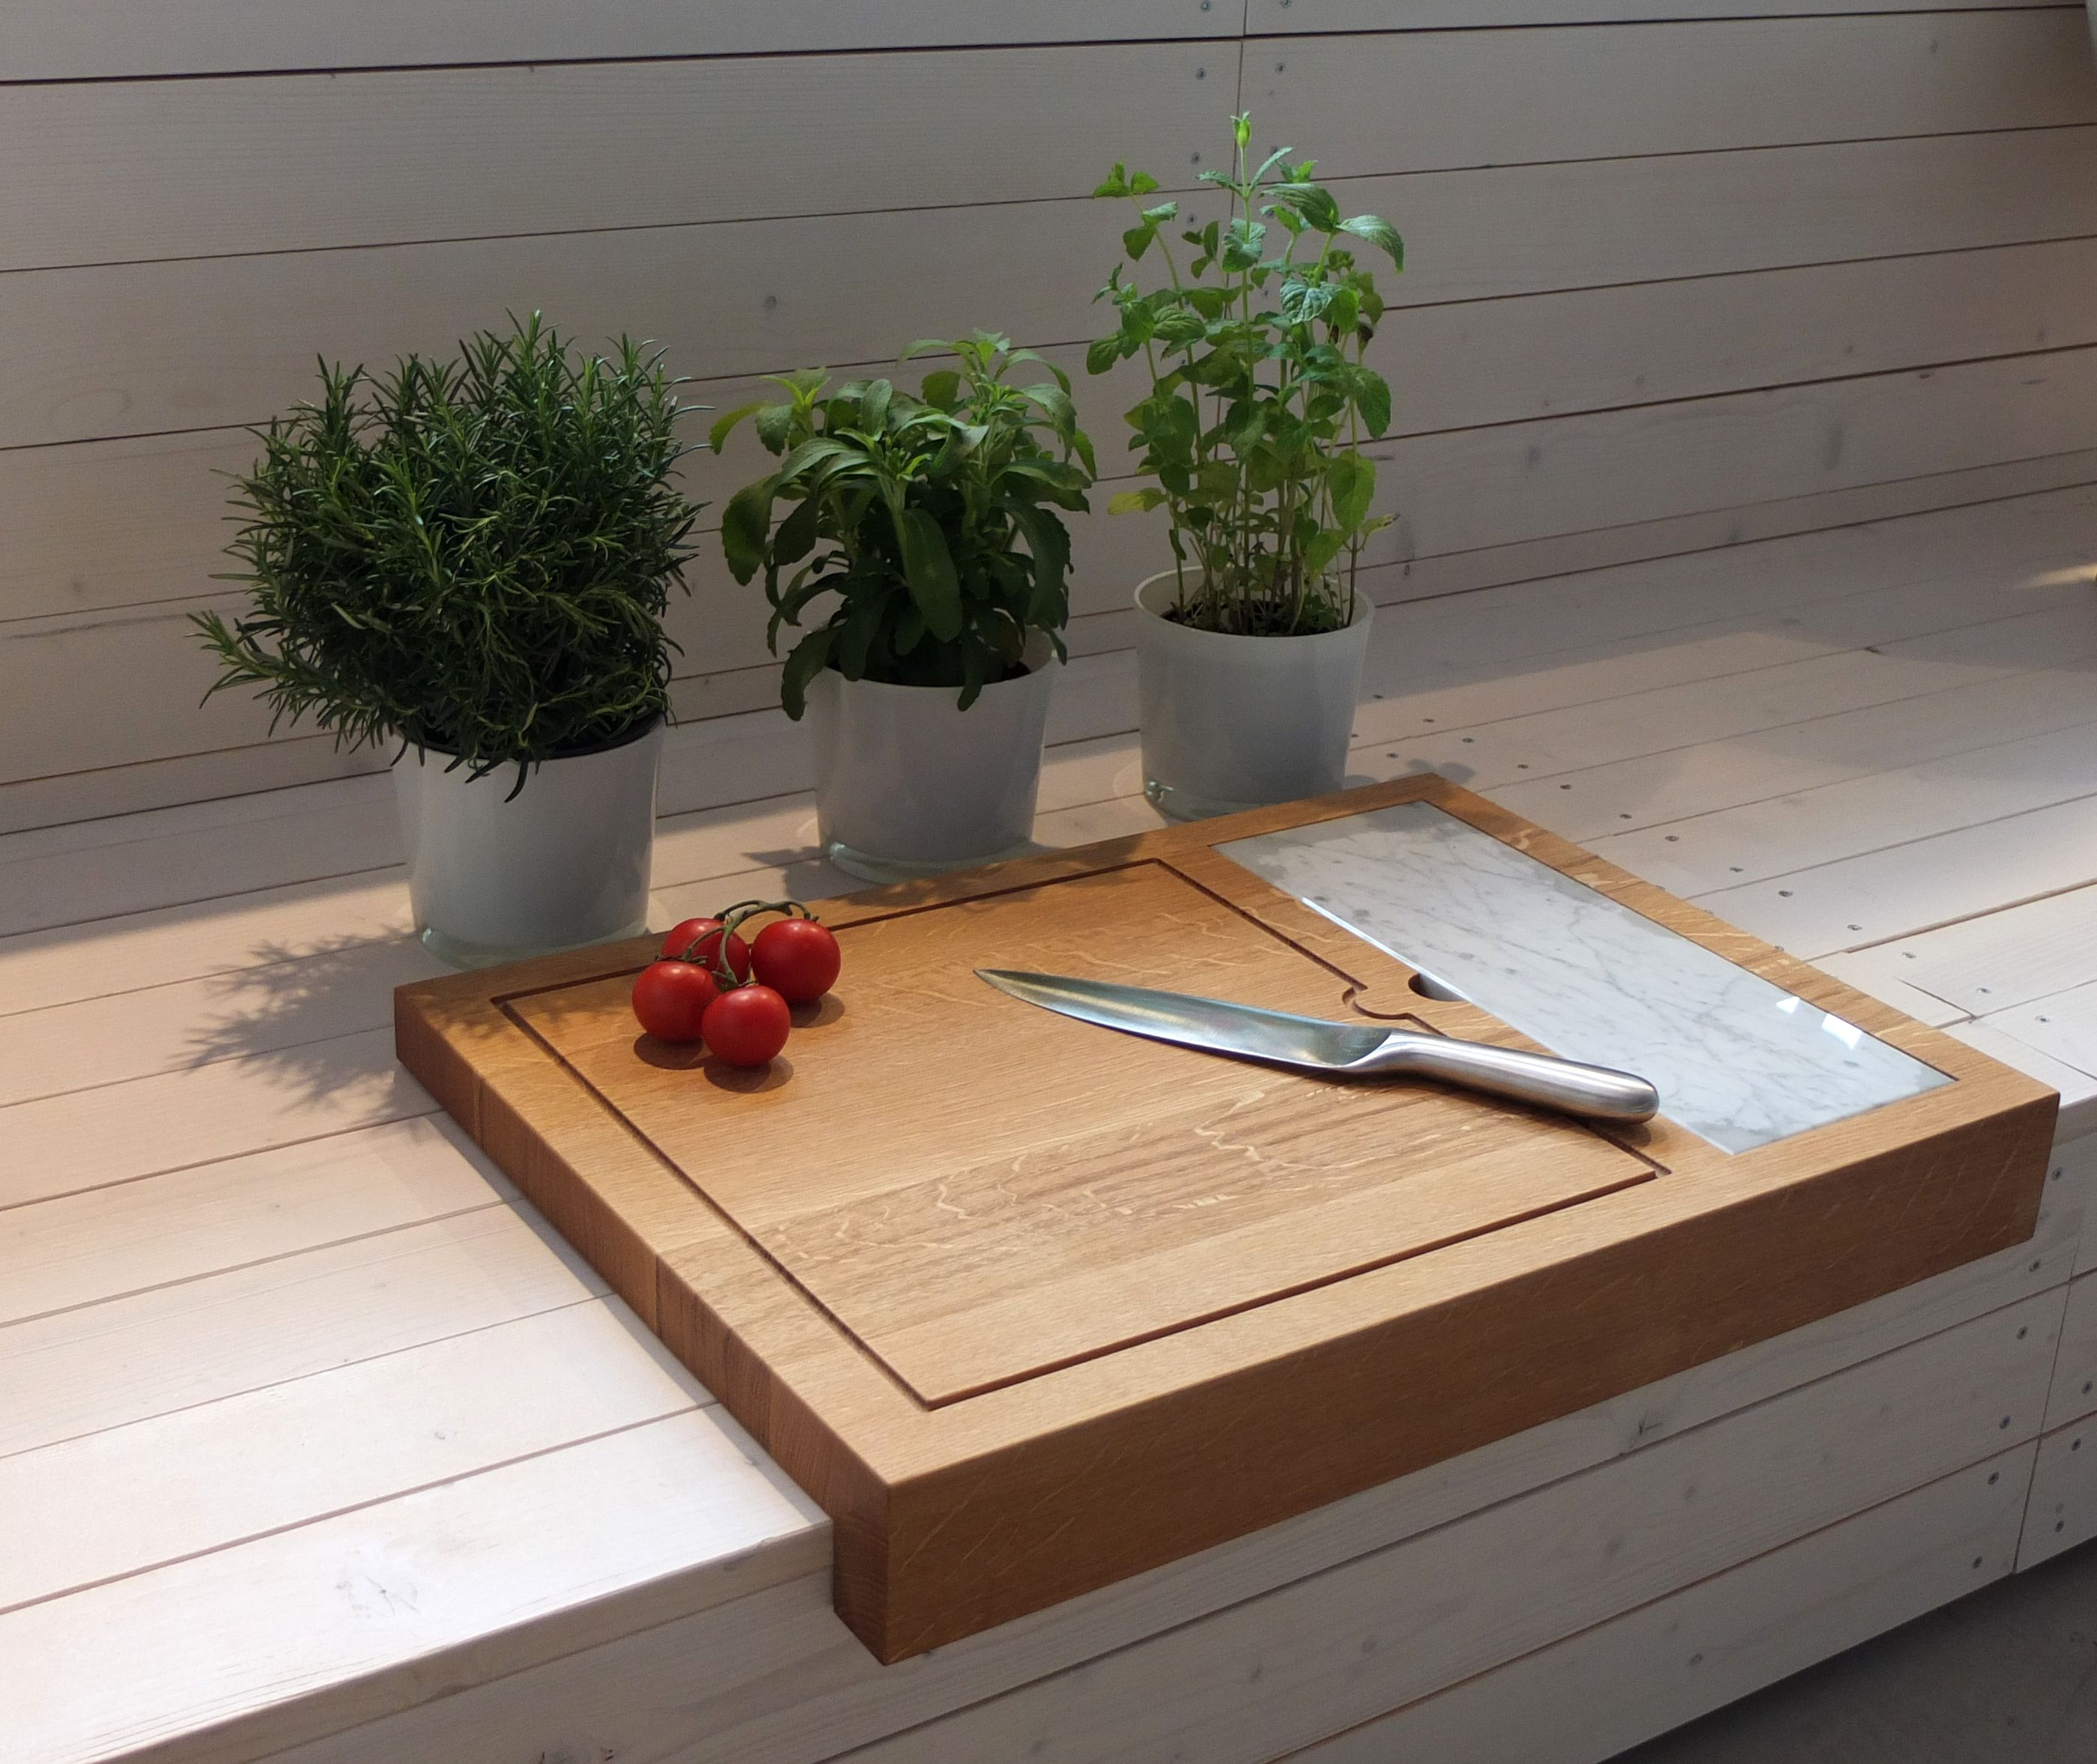 Holz Factory schneidebrett big johann holz marmor entworfenes küche